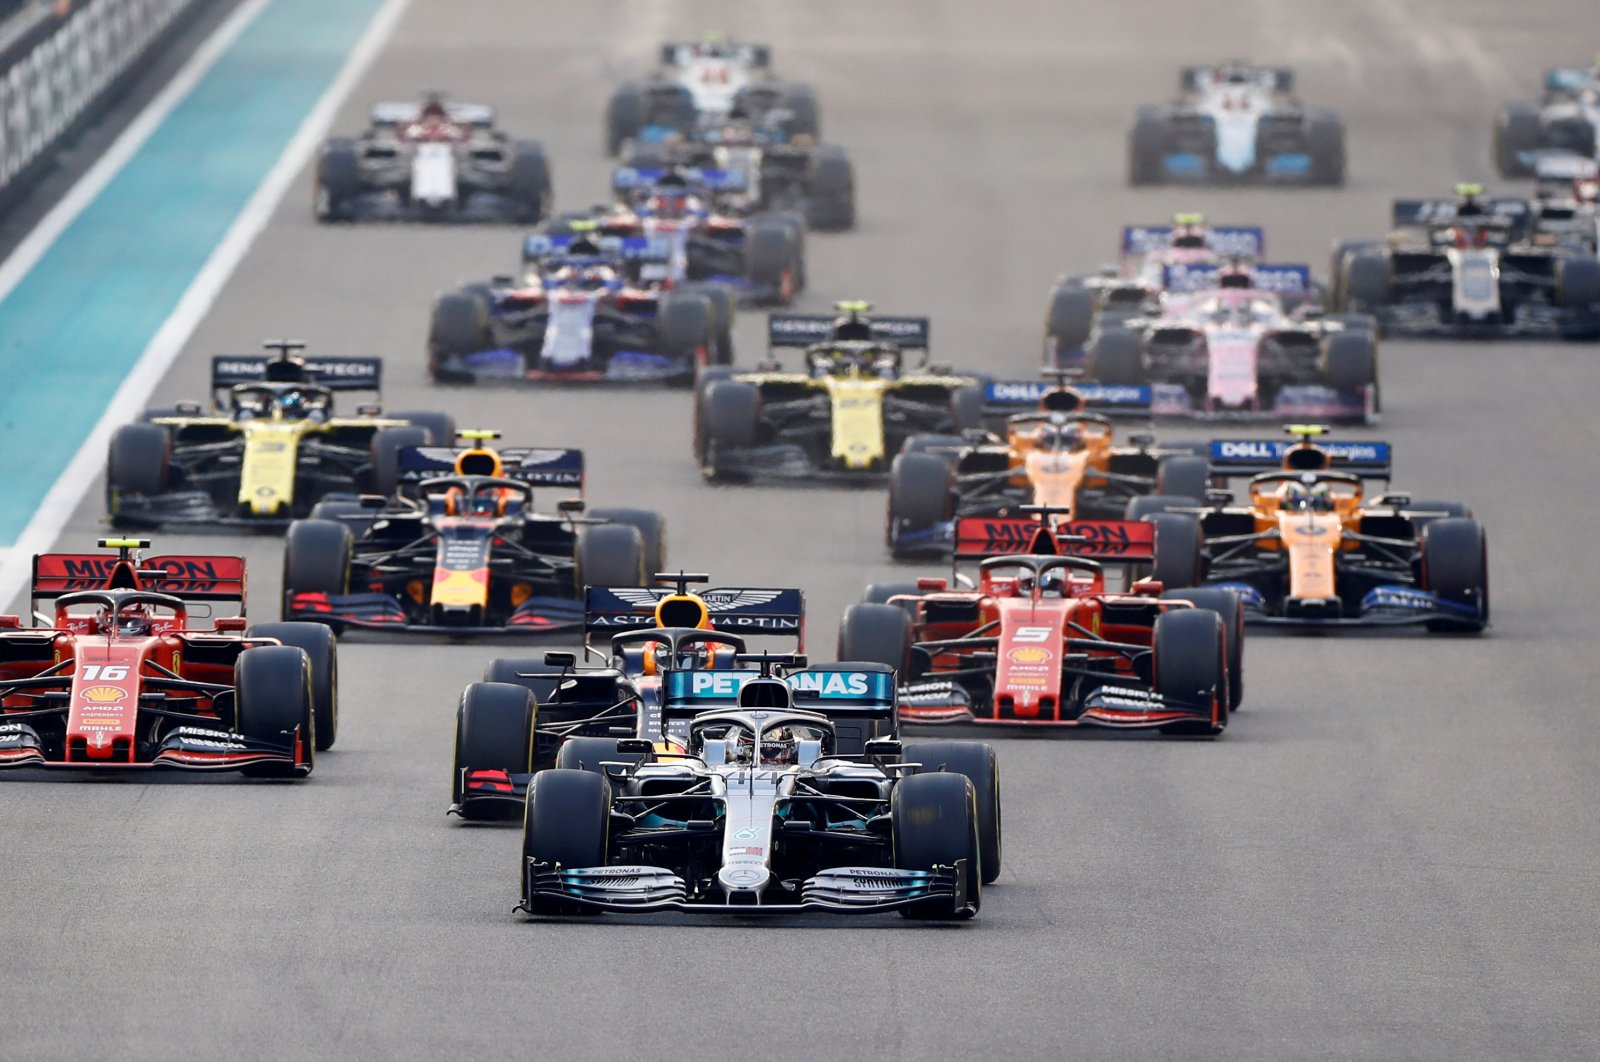 Mercedes' Lewis Hamilton in the lead during Abu Dhabi Grand Prix in Abu Dhabi, United Arab Emirates, Dec. 1, 2019. (Reuters Photo)